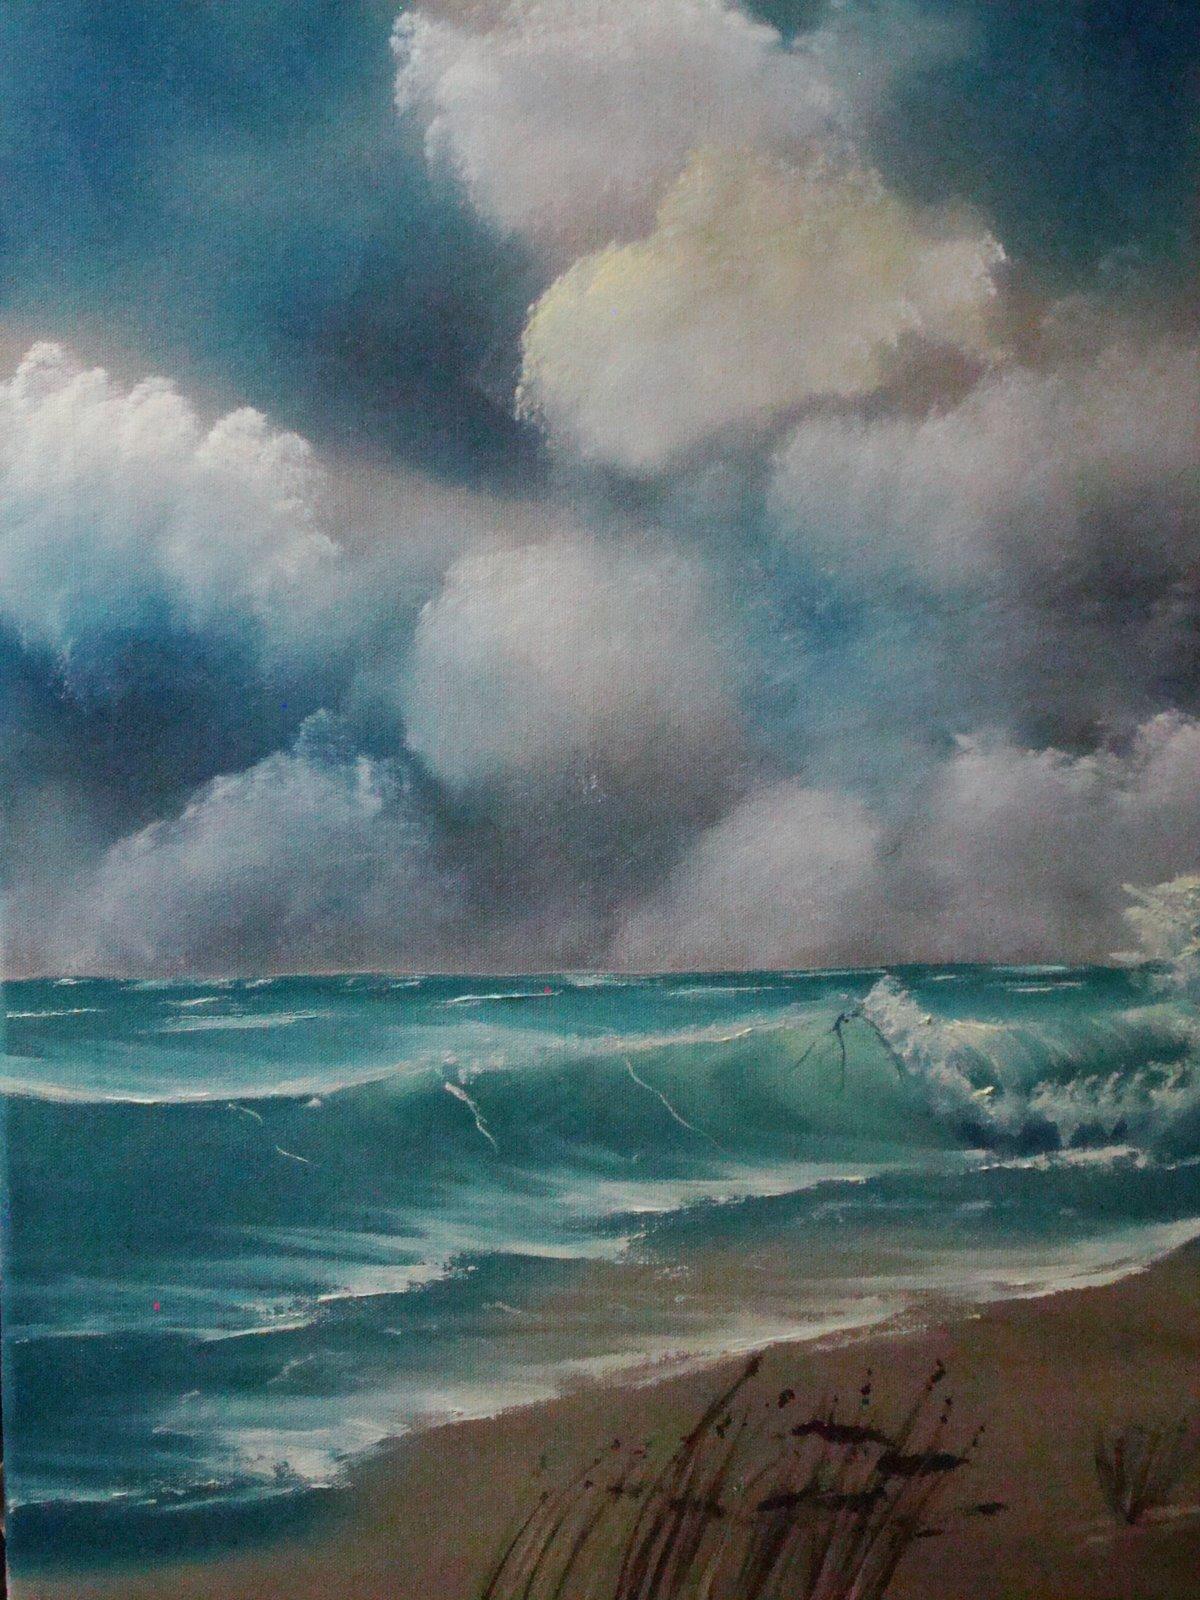 SEA 1003 Windy Waves 18 x 24